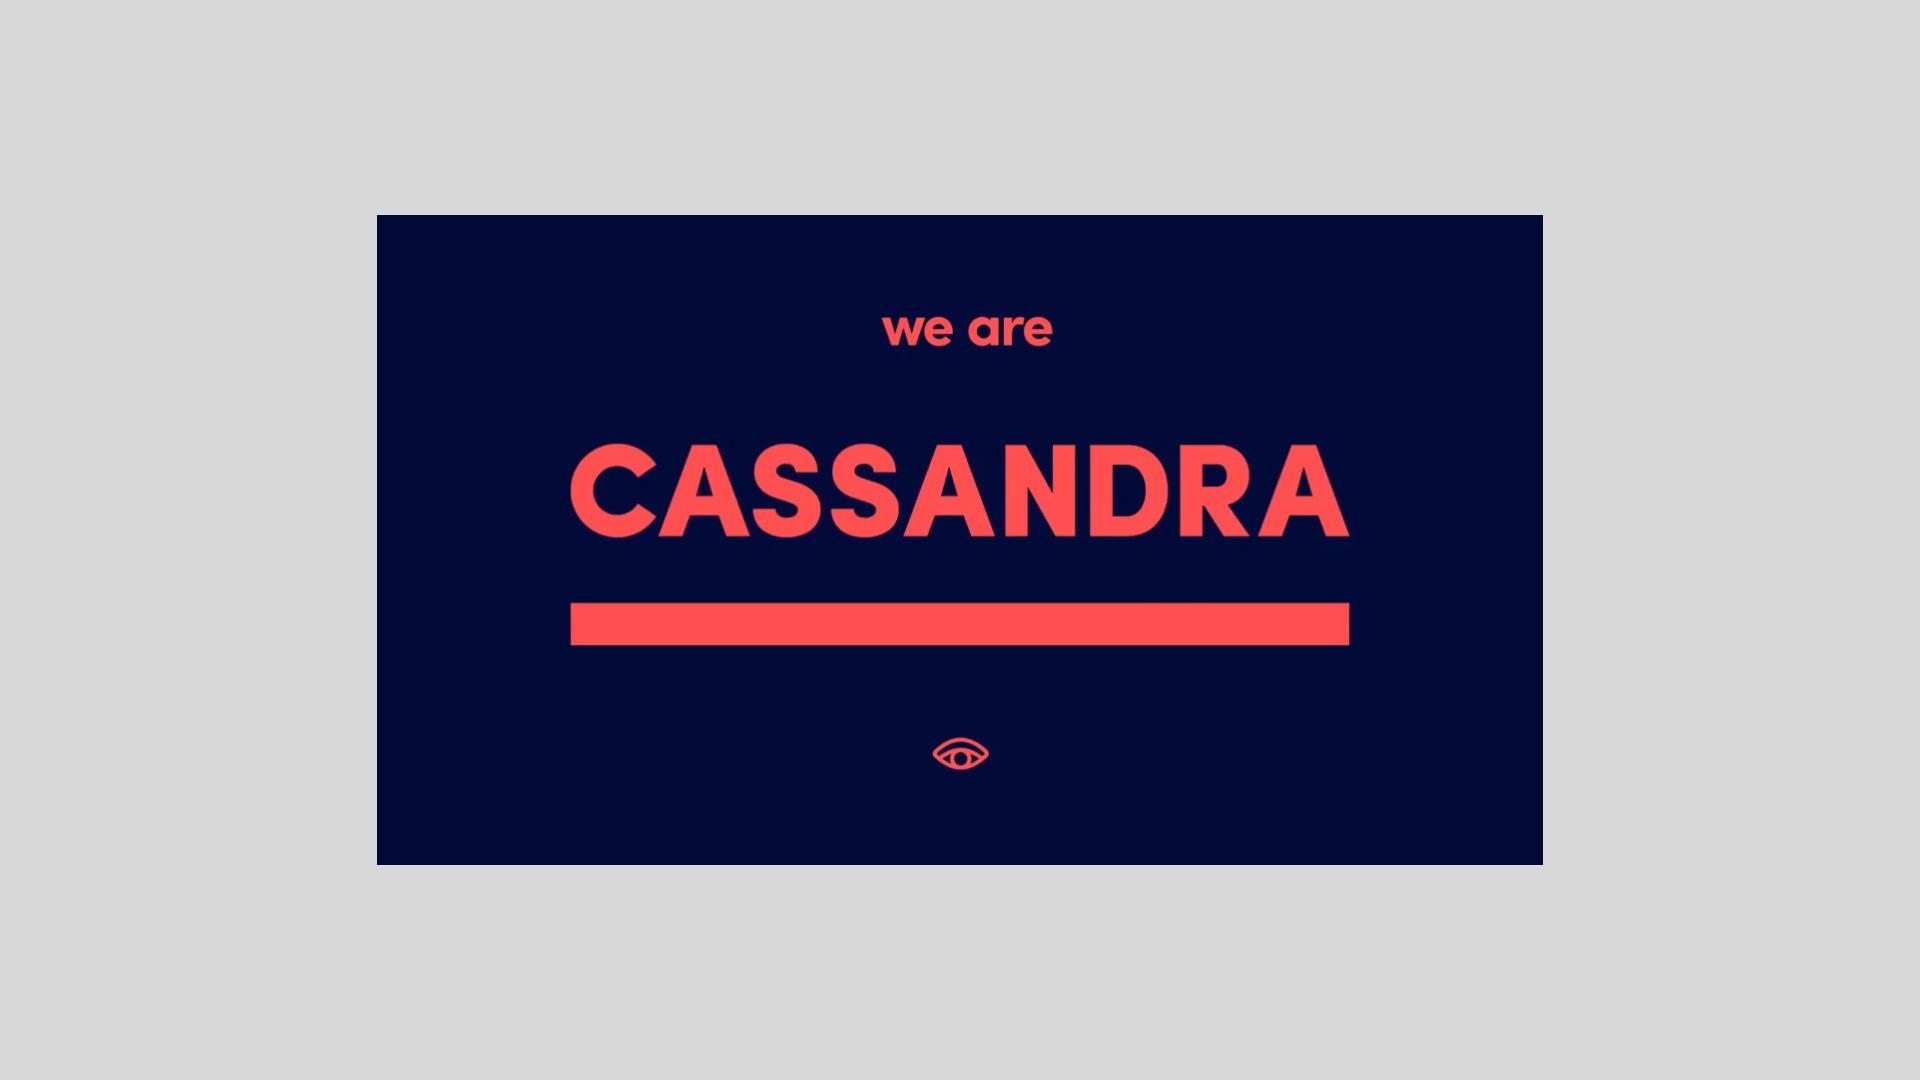 005_Slides_Cassandra_1